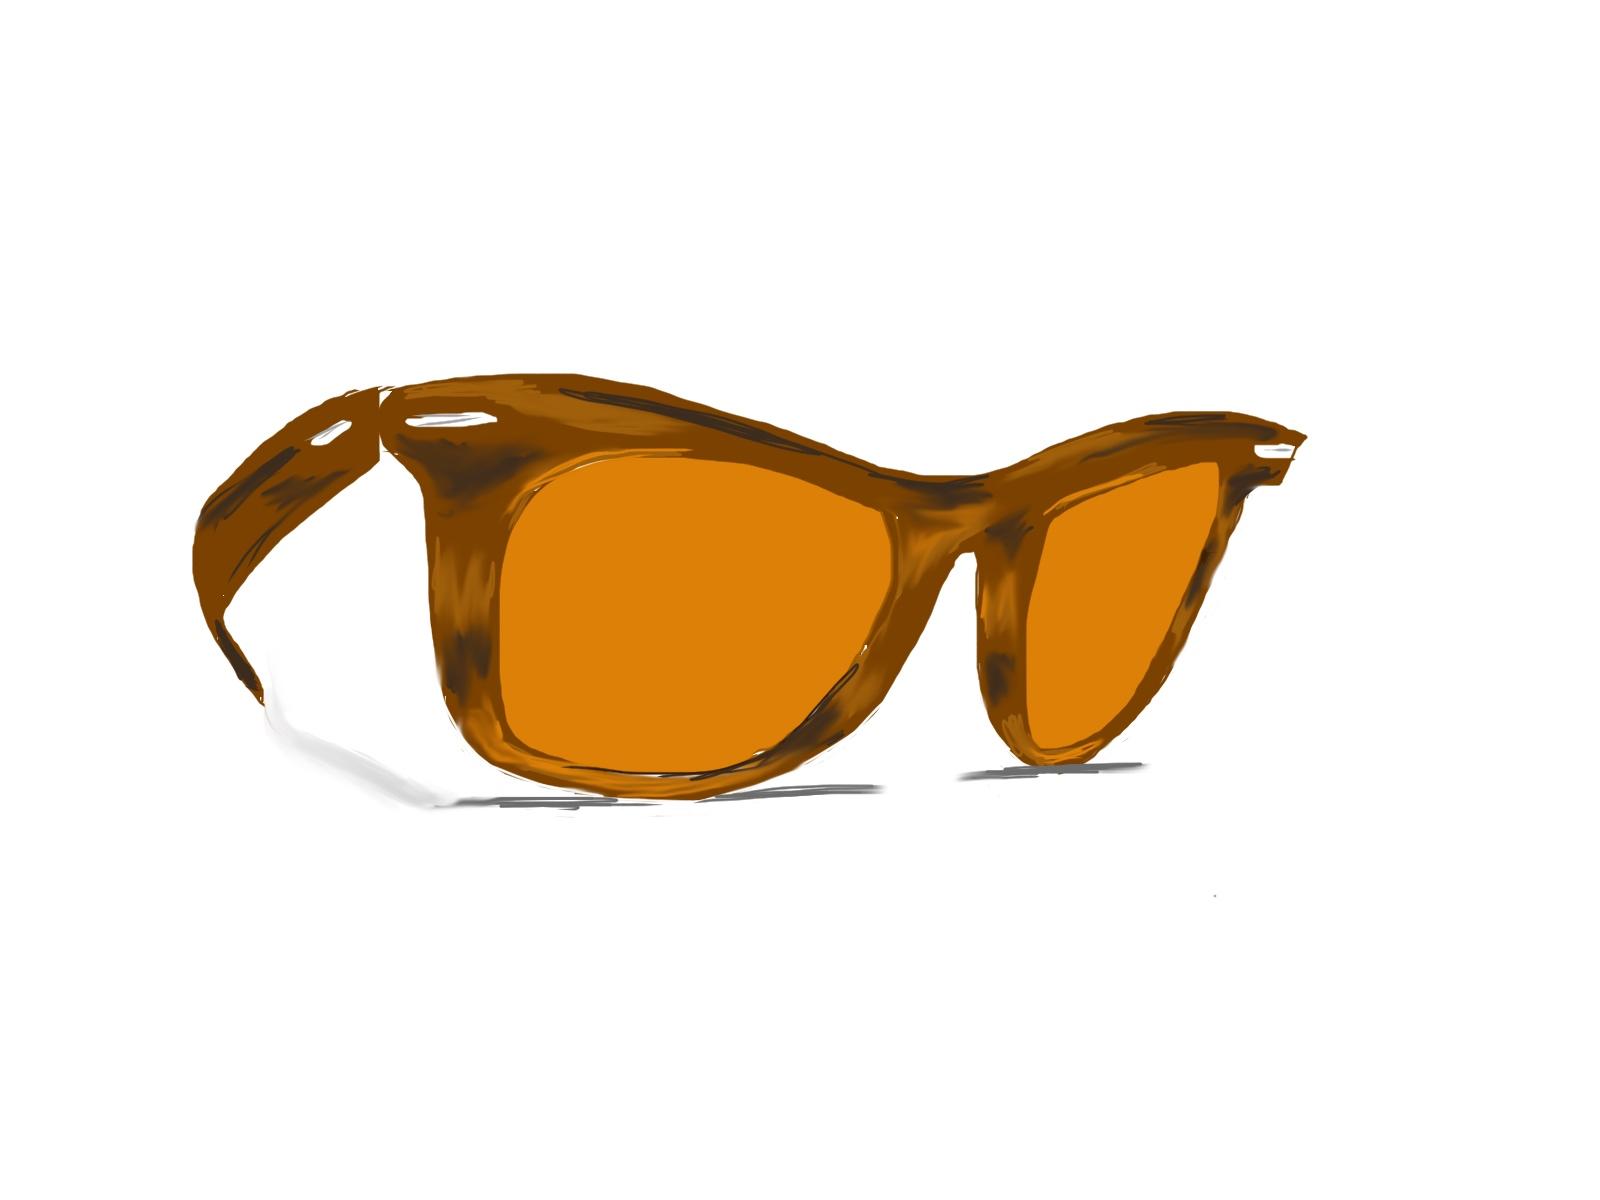 Vintage Ray Ban Wayfarer Sunglasses